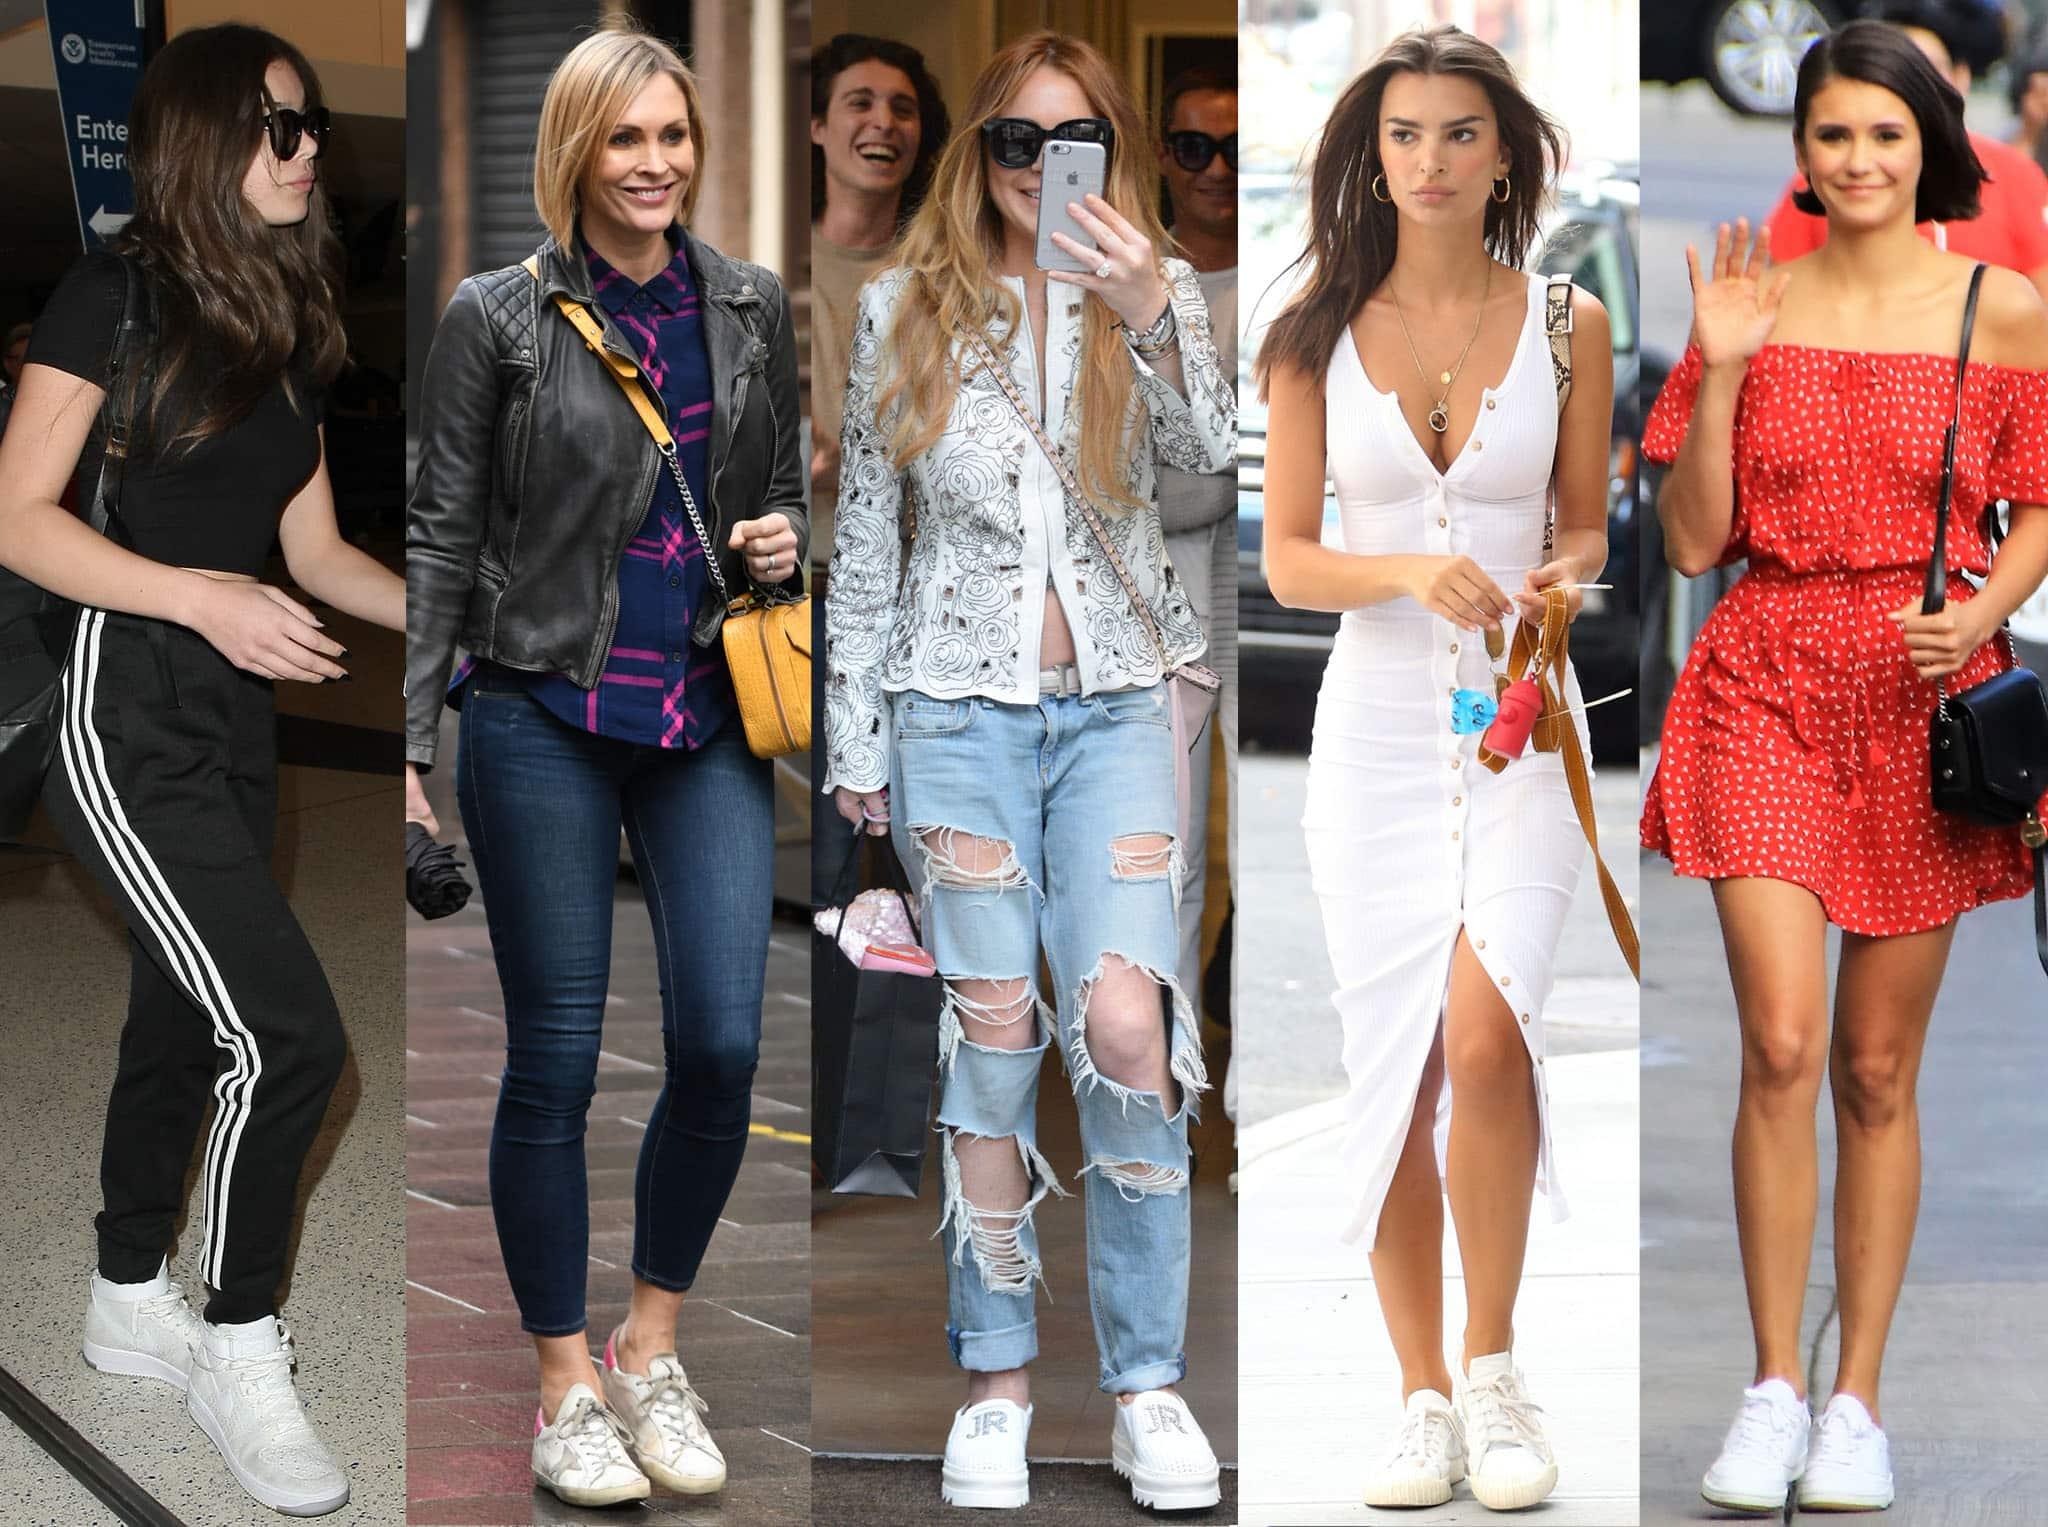 Hailee Steinfeld, Jenni Falconer, Lindsay Lohan, Emily Ratajkowski, and Nina Dobrev show different ways to wear white sneakers